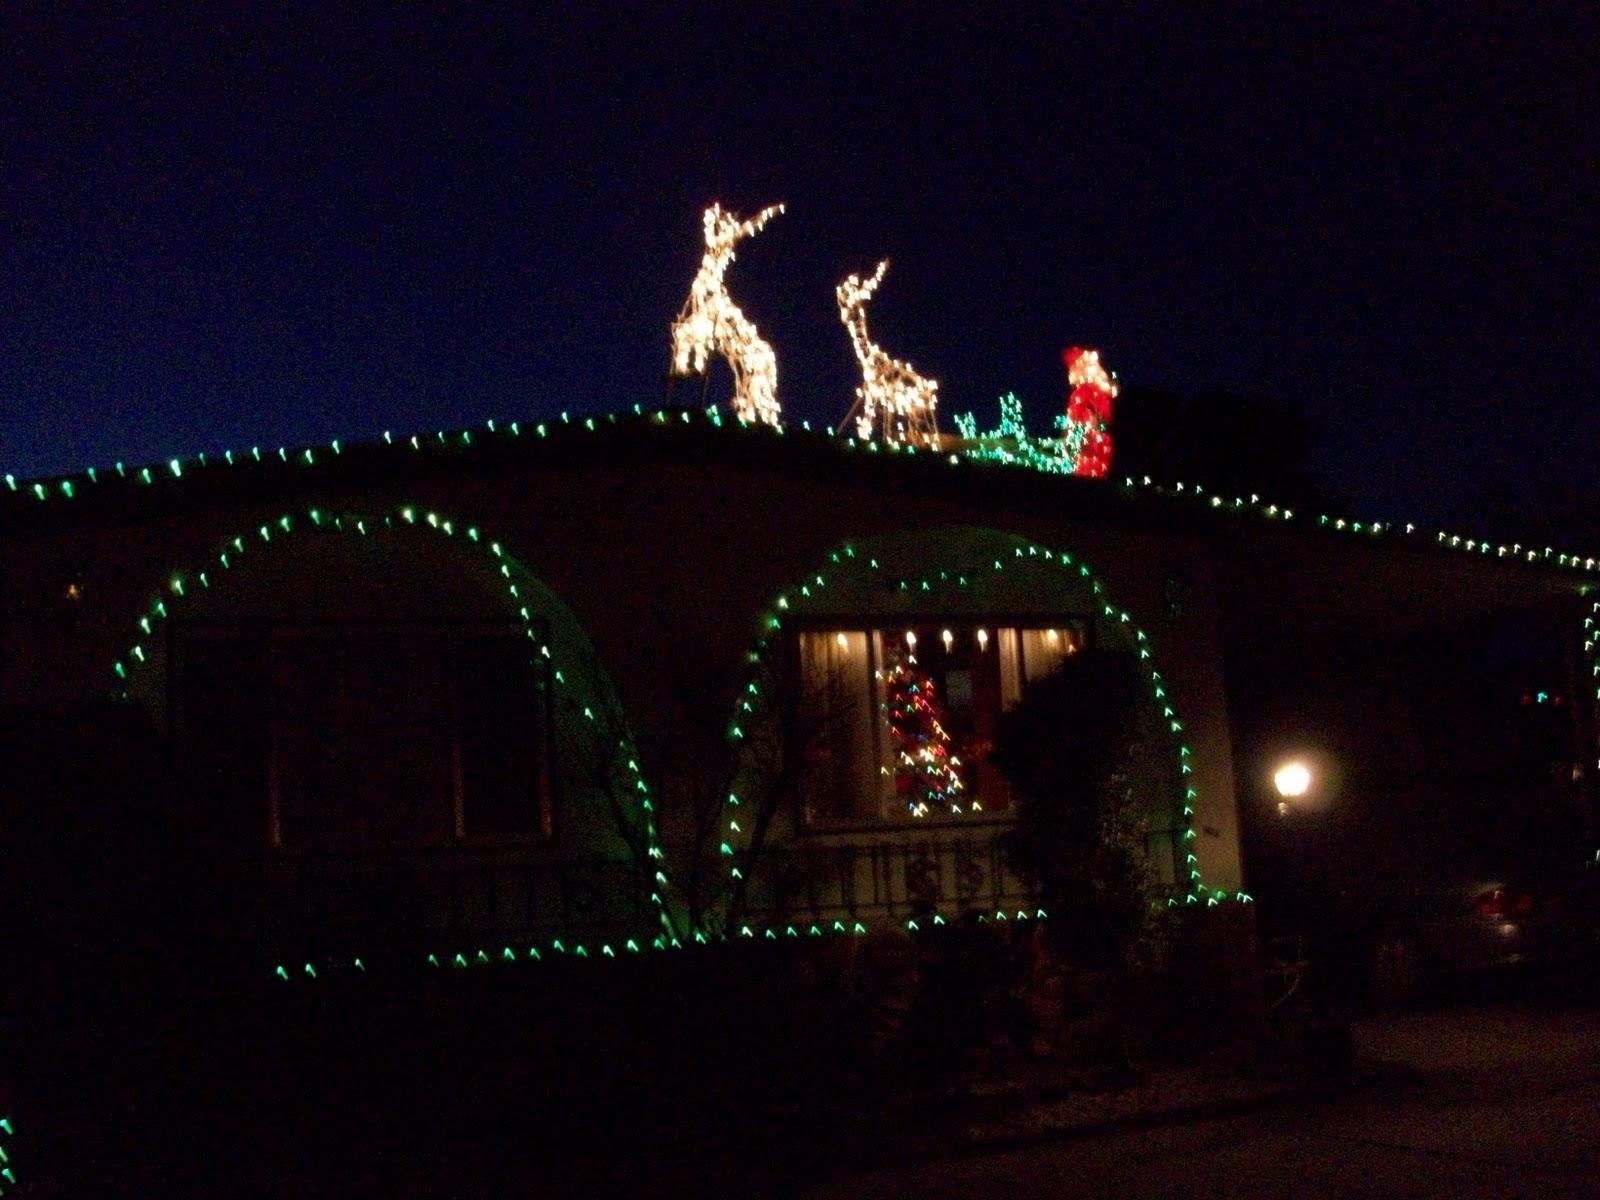 Santa and reindeer roof displays myideasbedroom com